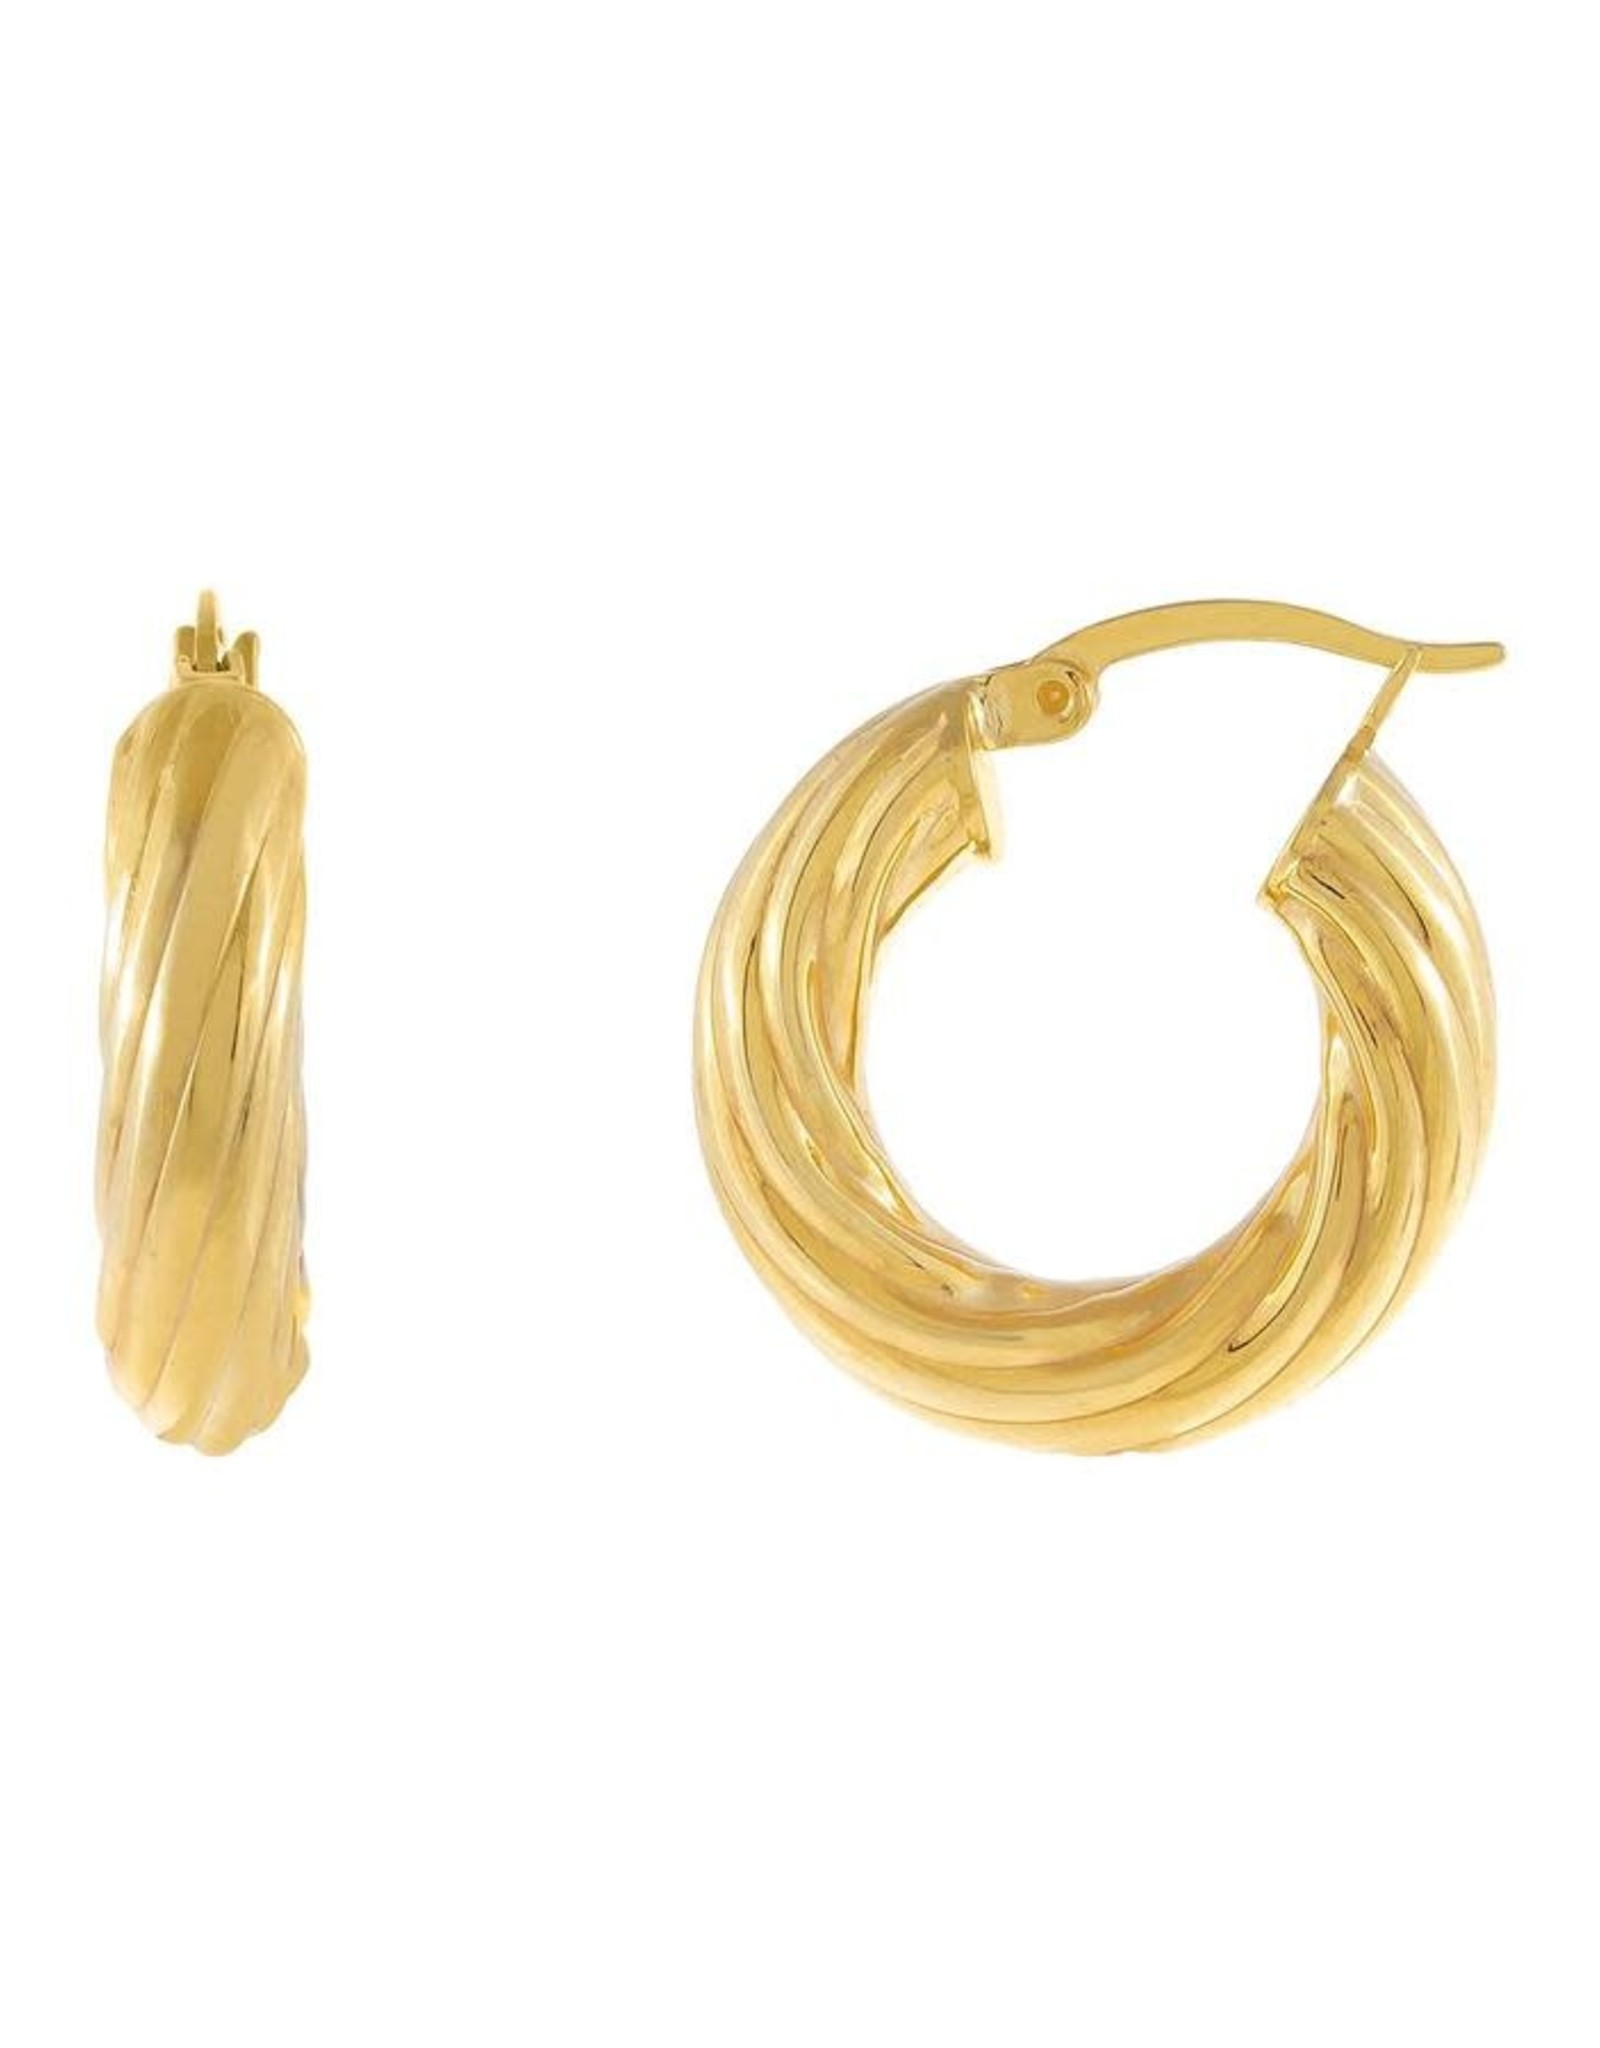 Adinas Chunky Hollow Twisted Hoop Earring 20mm